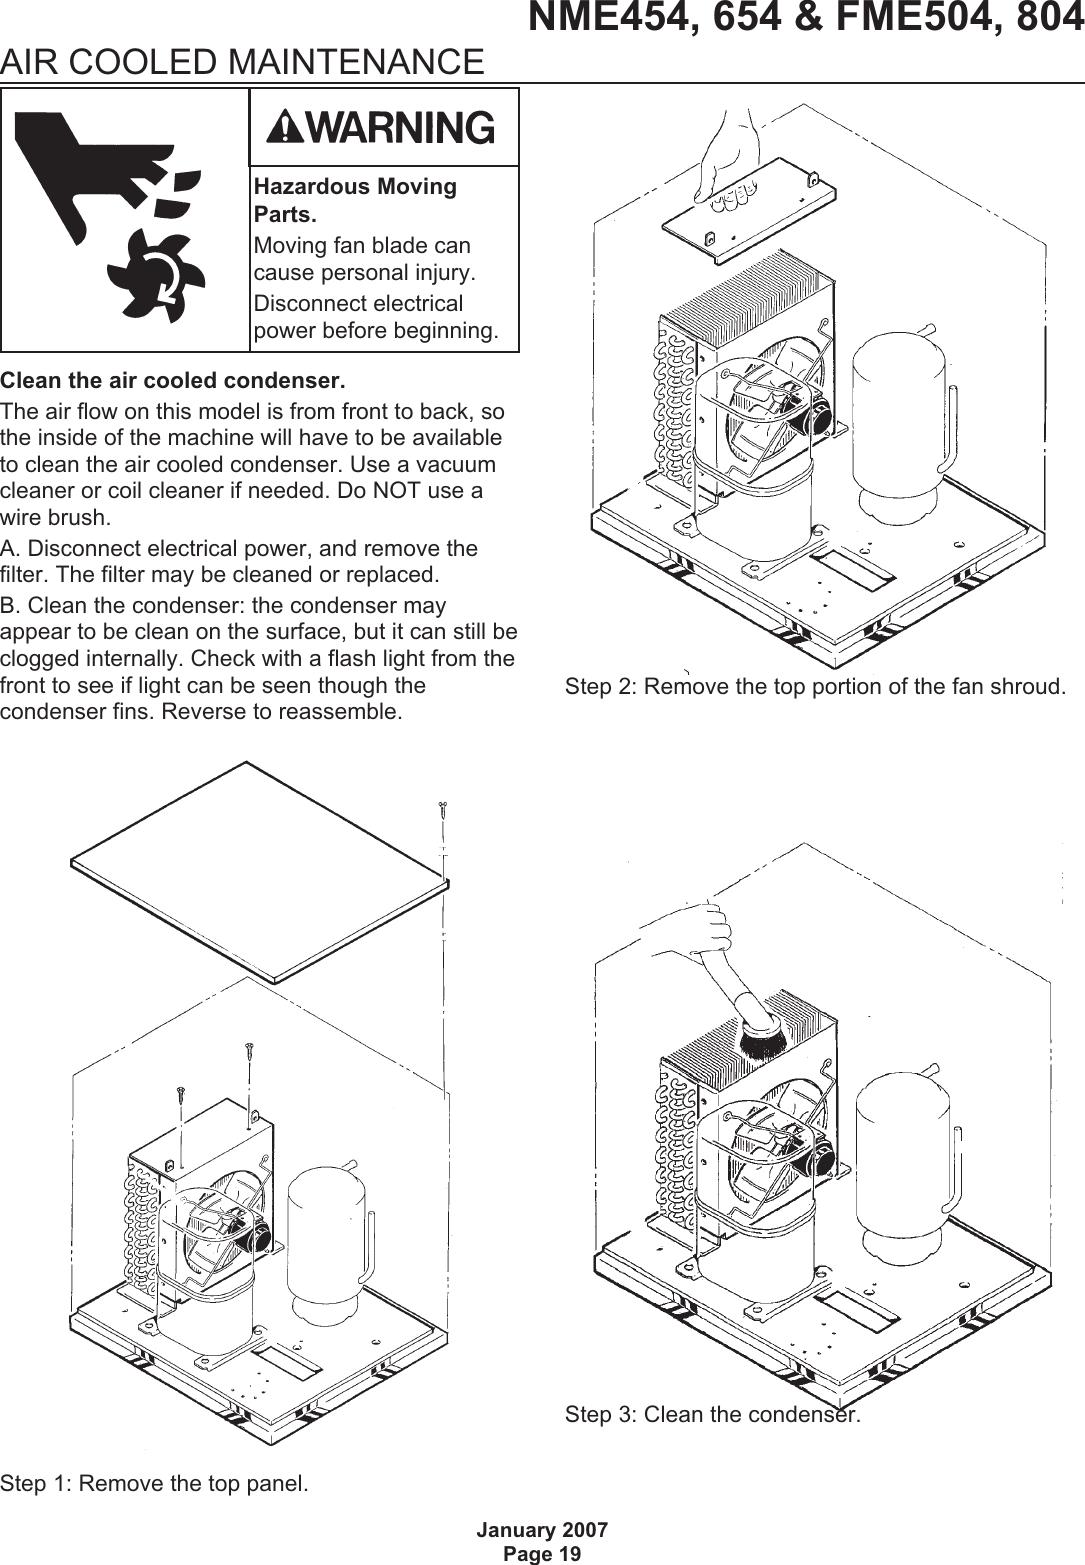 Scotsman Fme504 Users Manual Nfme654mn vp